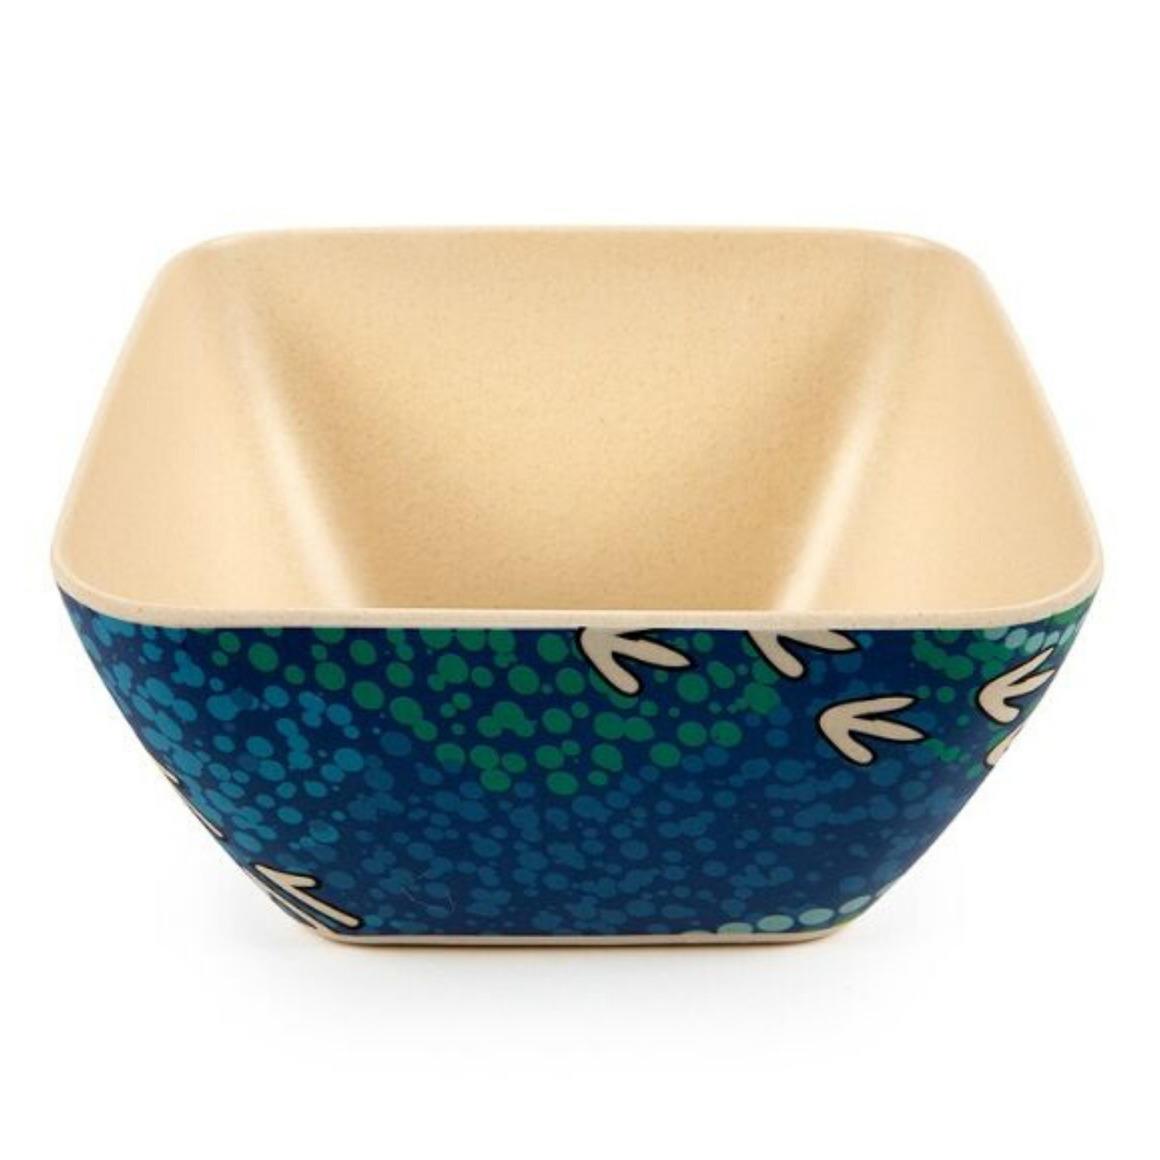 Bowls Bamboo Aboriginal Design - Wet Design - Luther Cora  (Set of 2)   Trada Marketplace